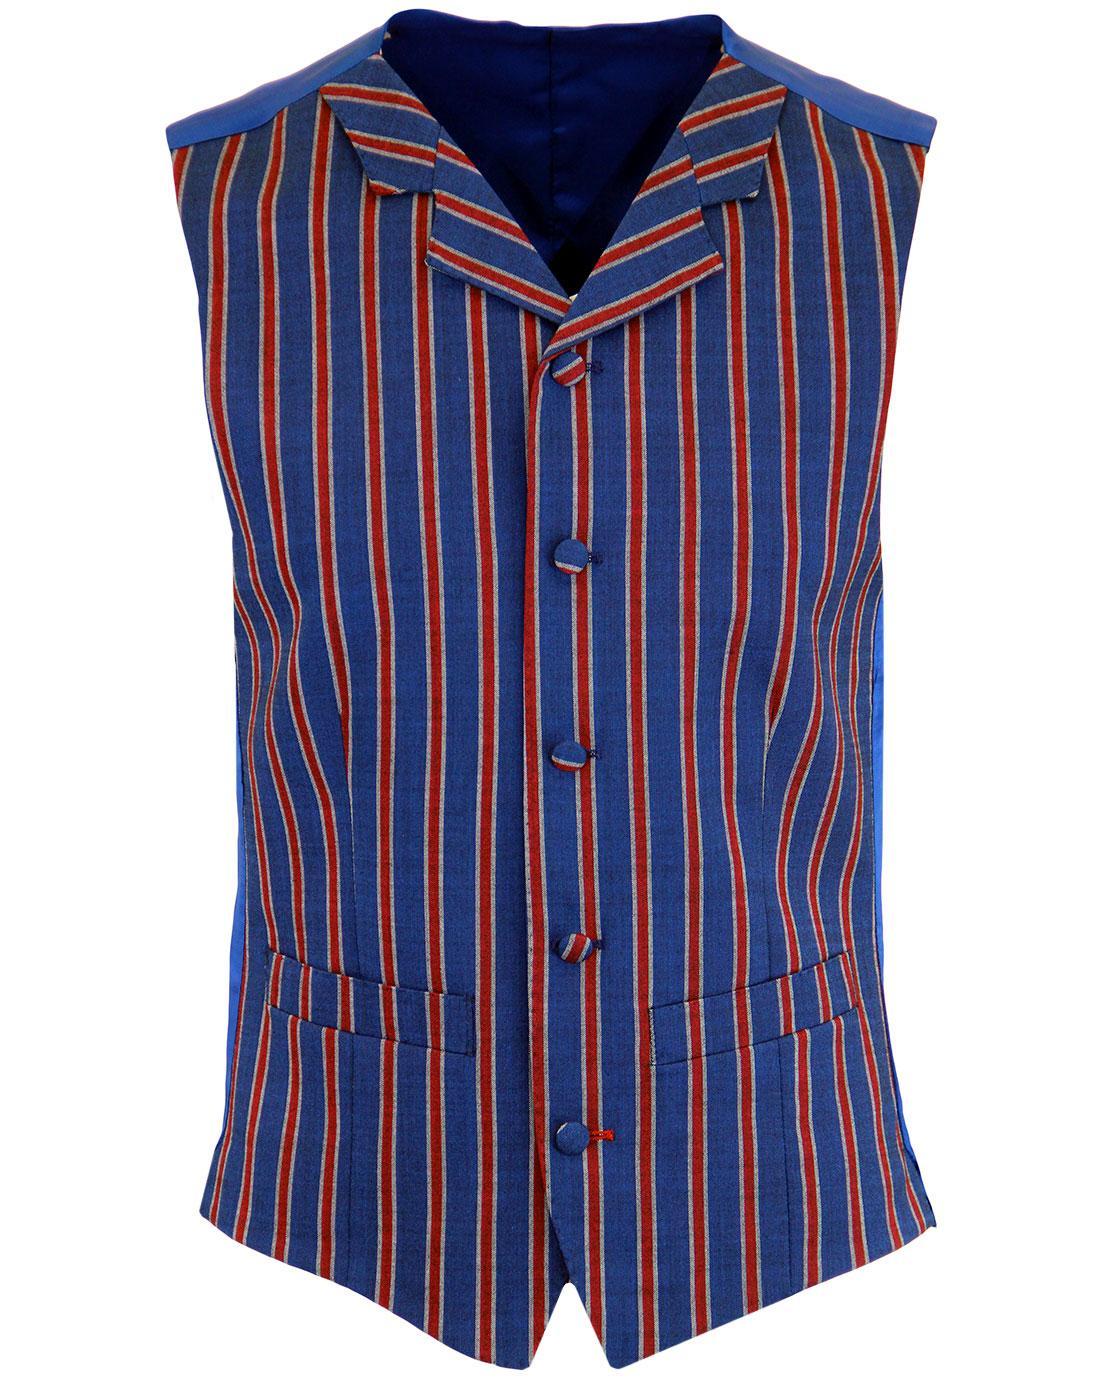 MADCAP ENGLAND Mod Regatta Stripe Lapel Waistcoat